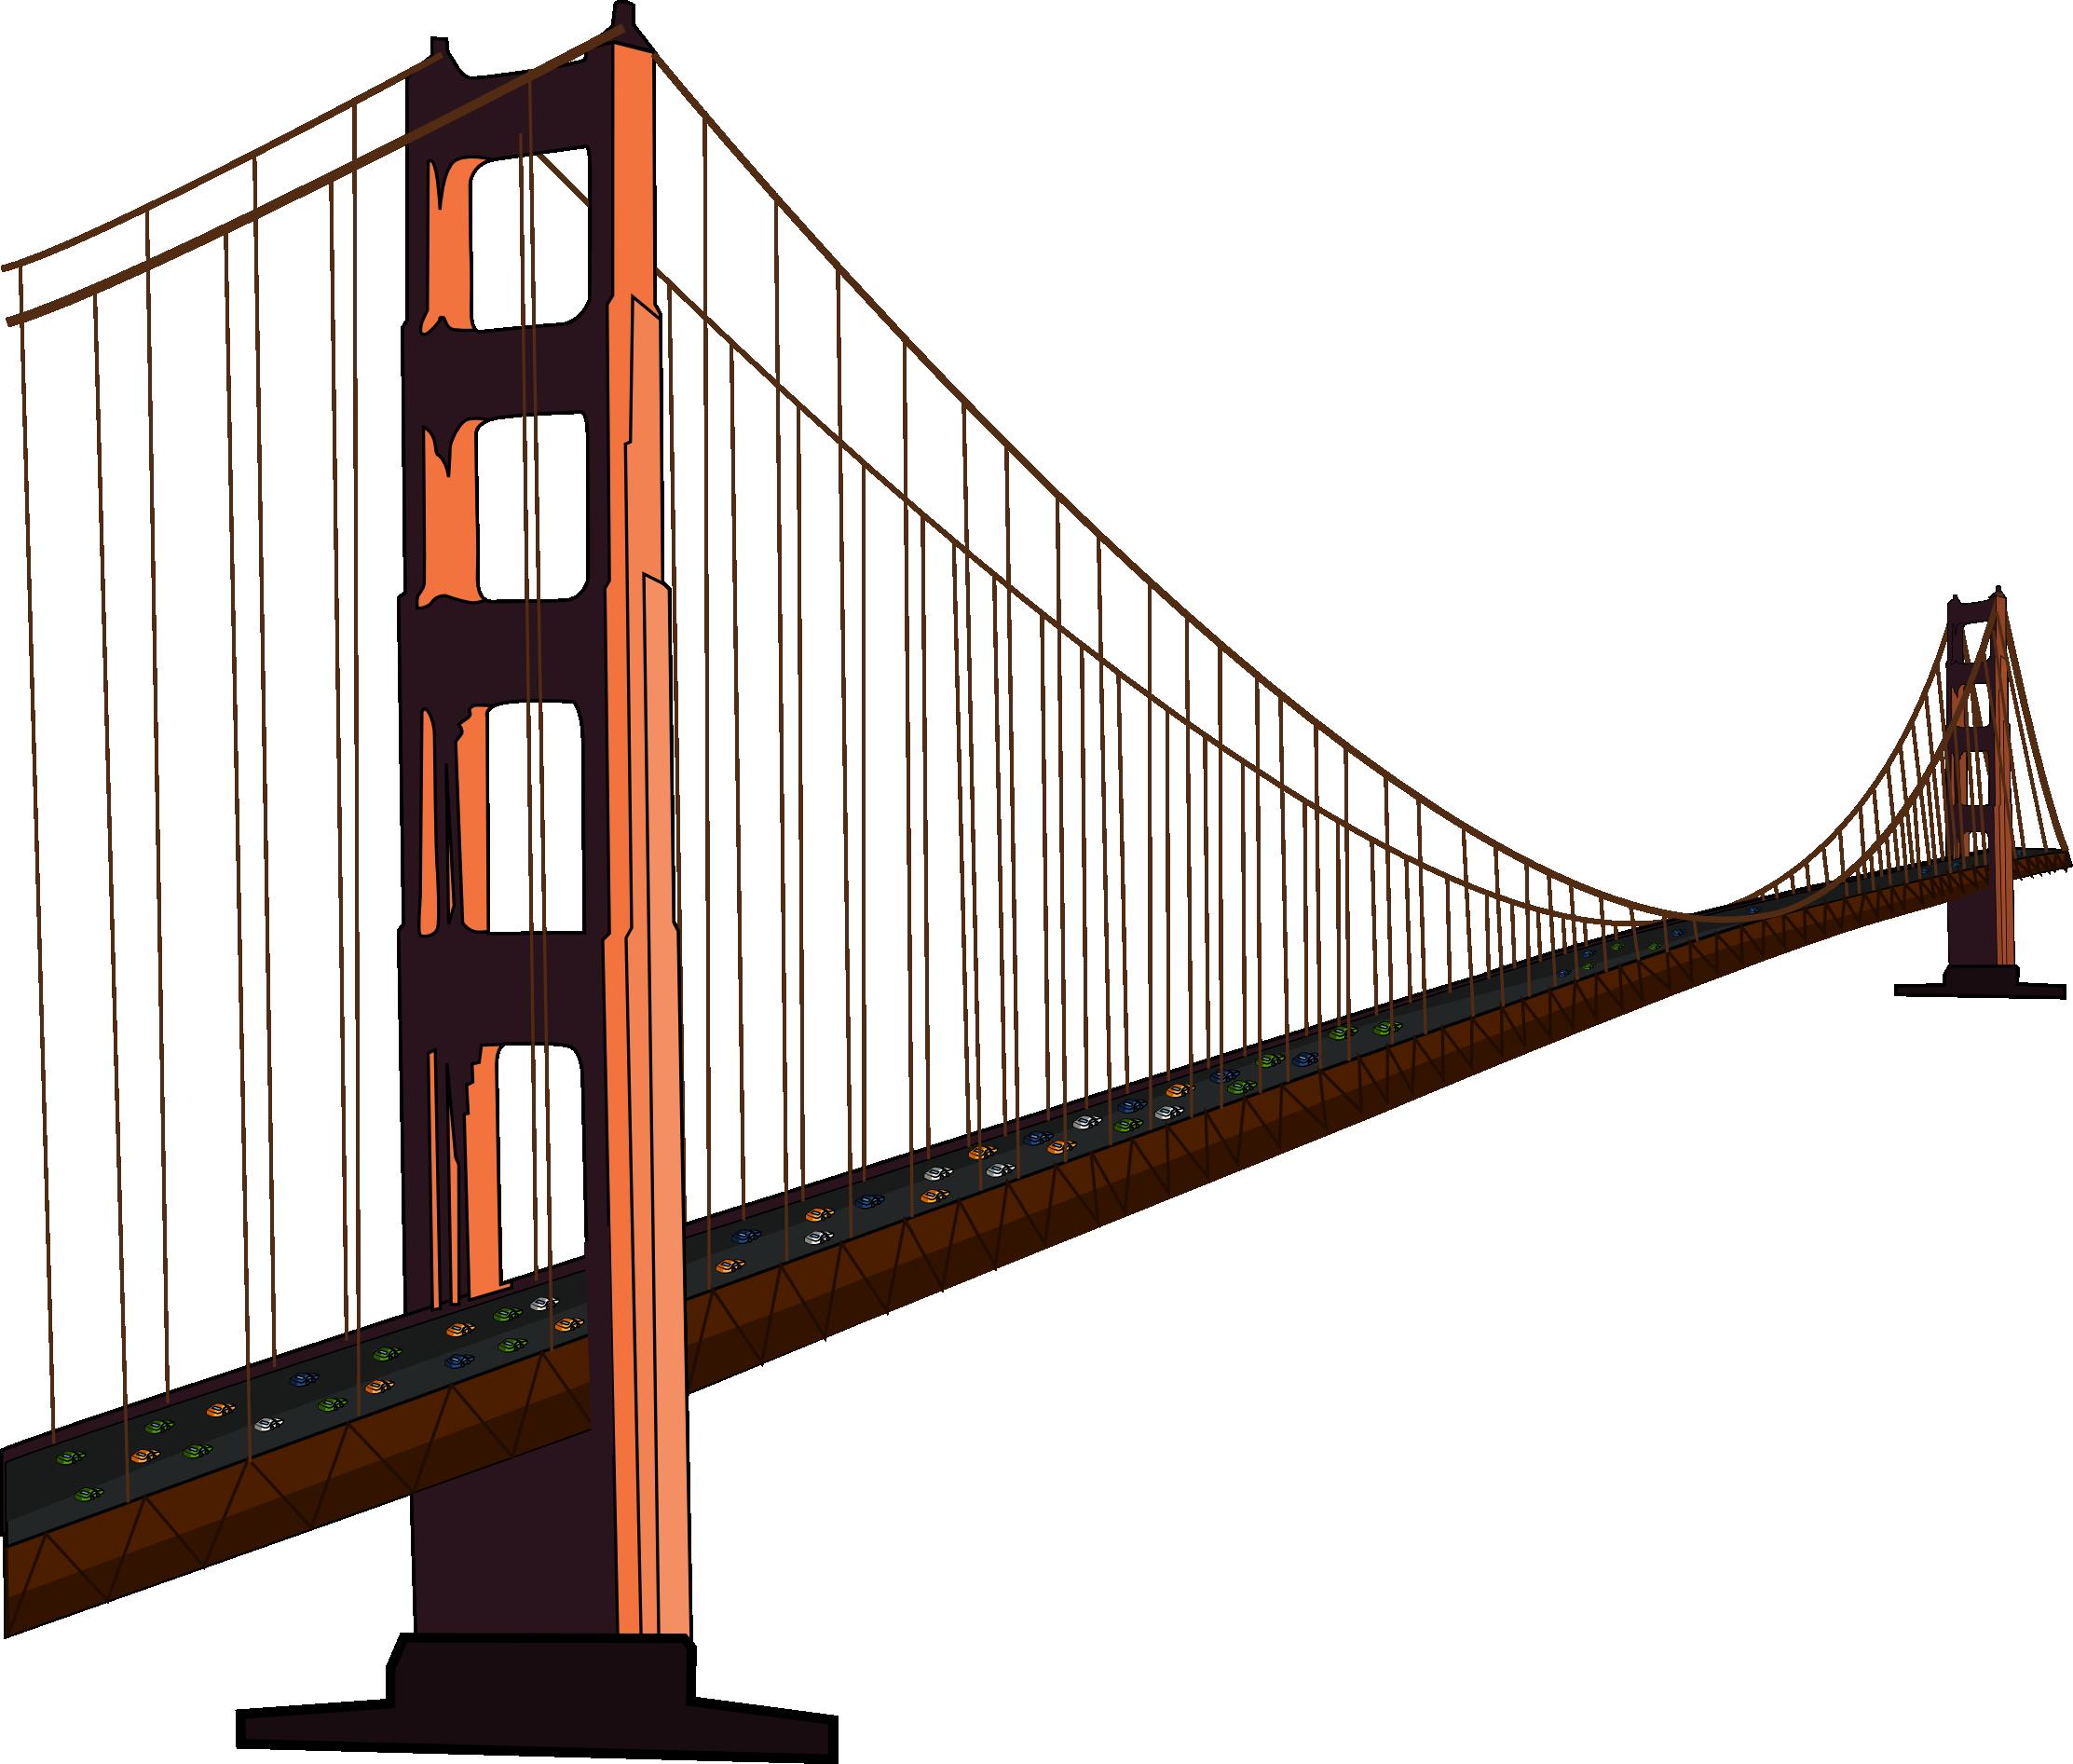 Free Golden Gate Bridge Clip .-Free Golden Gate Bridge Clip .-16